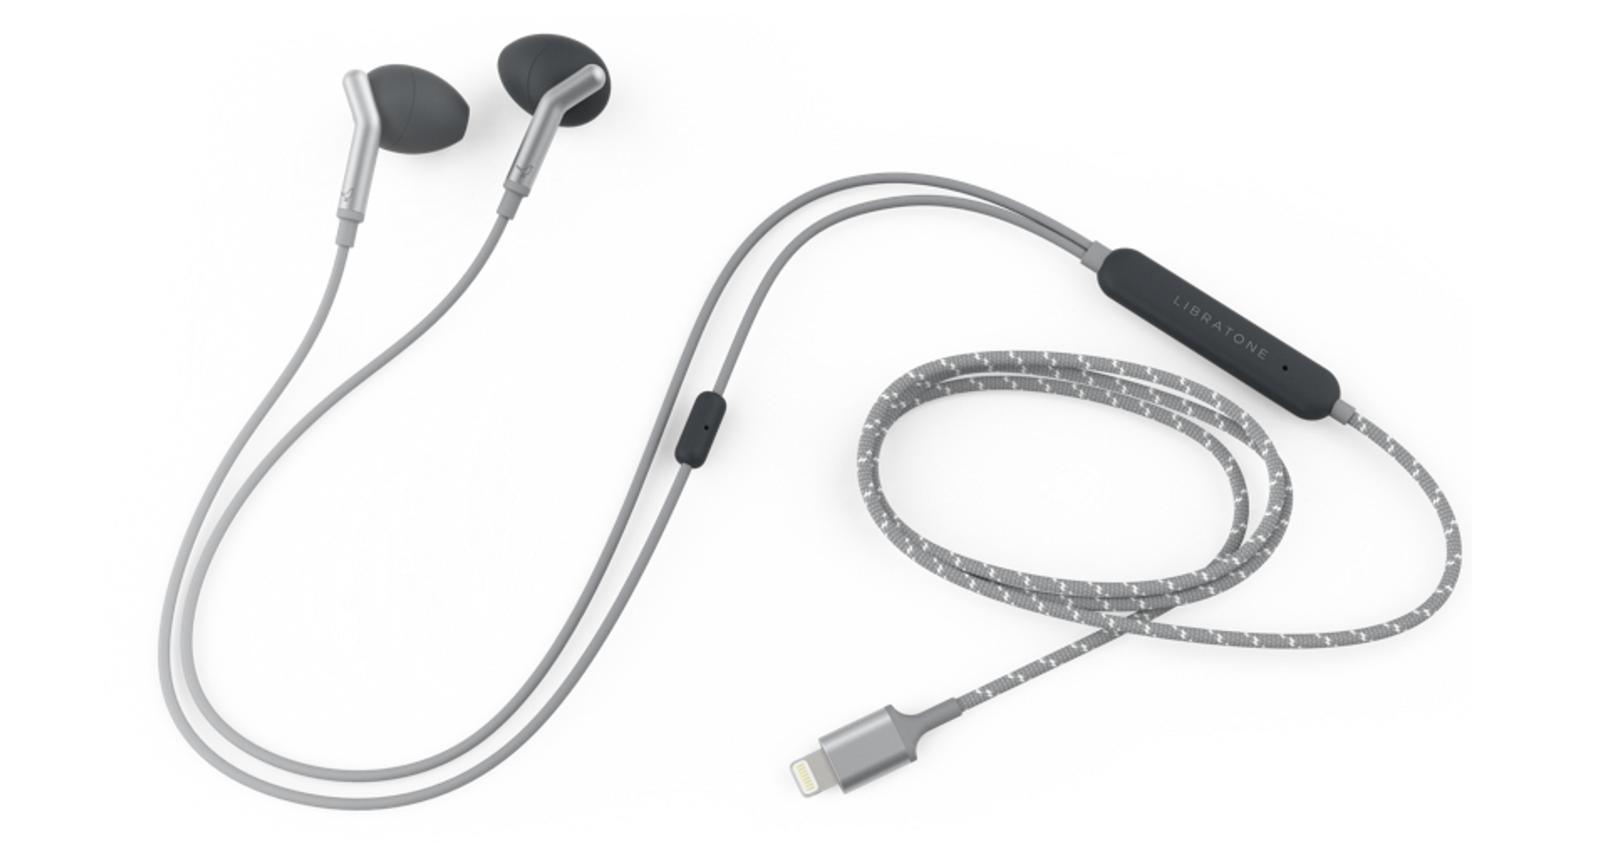 Libratone-Q-Adapt-Lightning-Earbuds